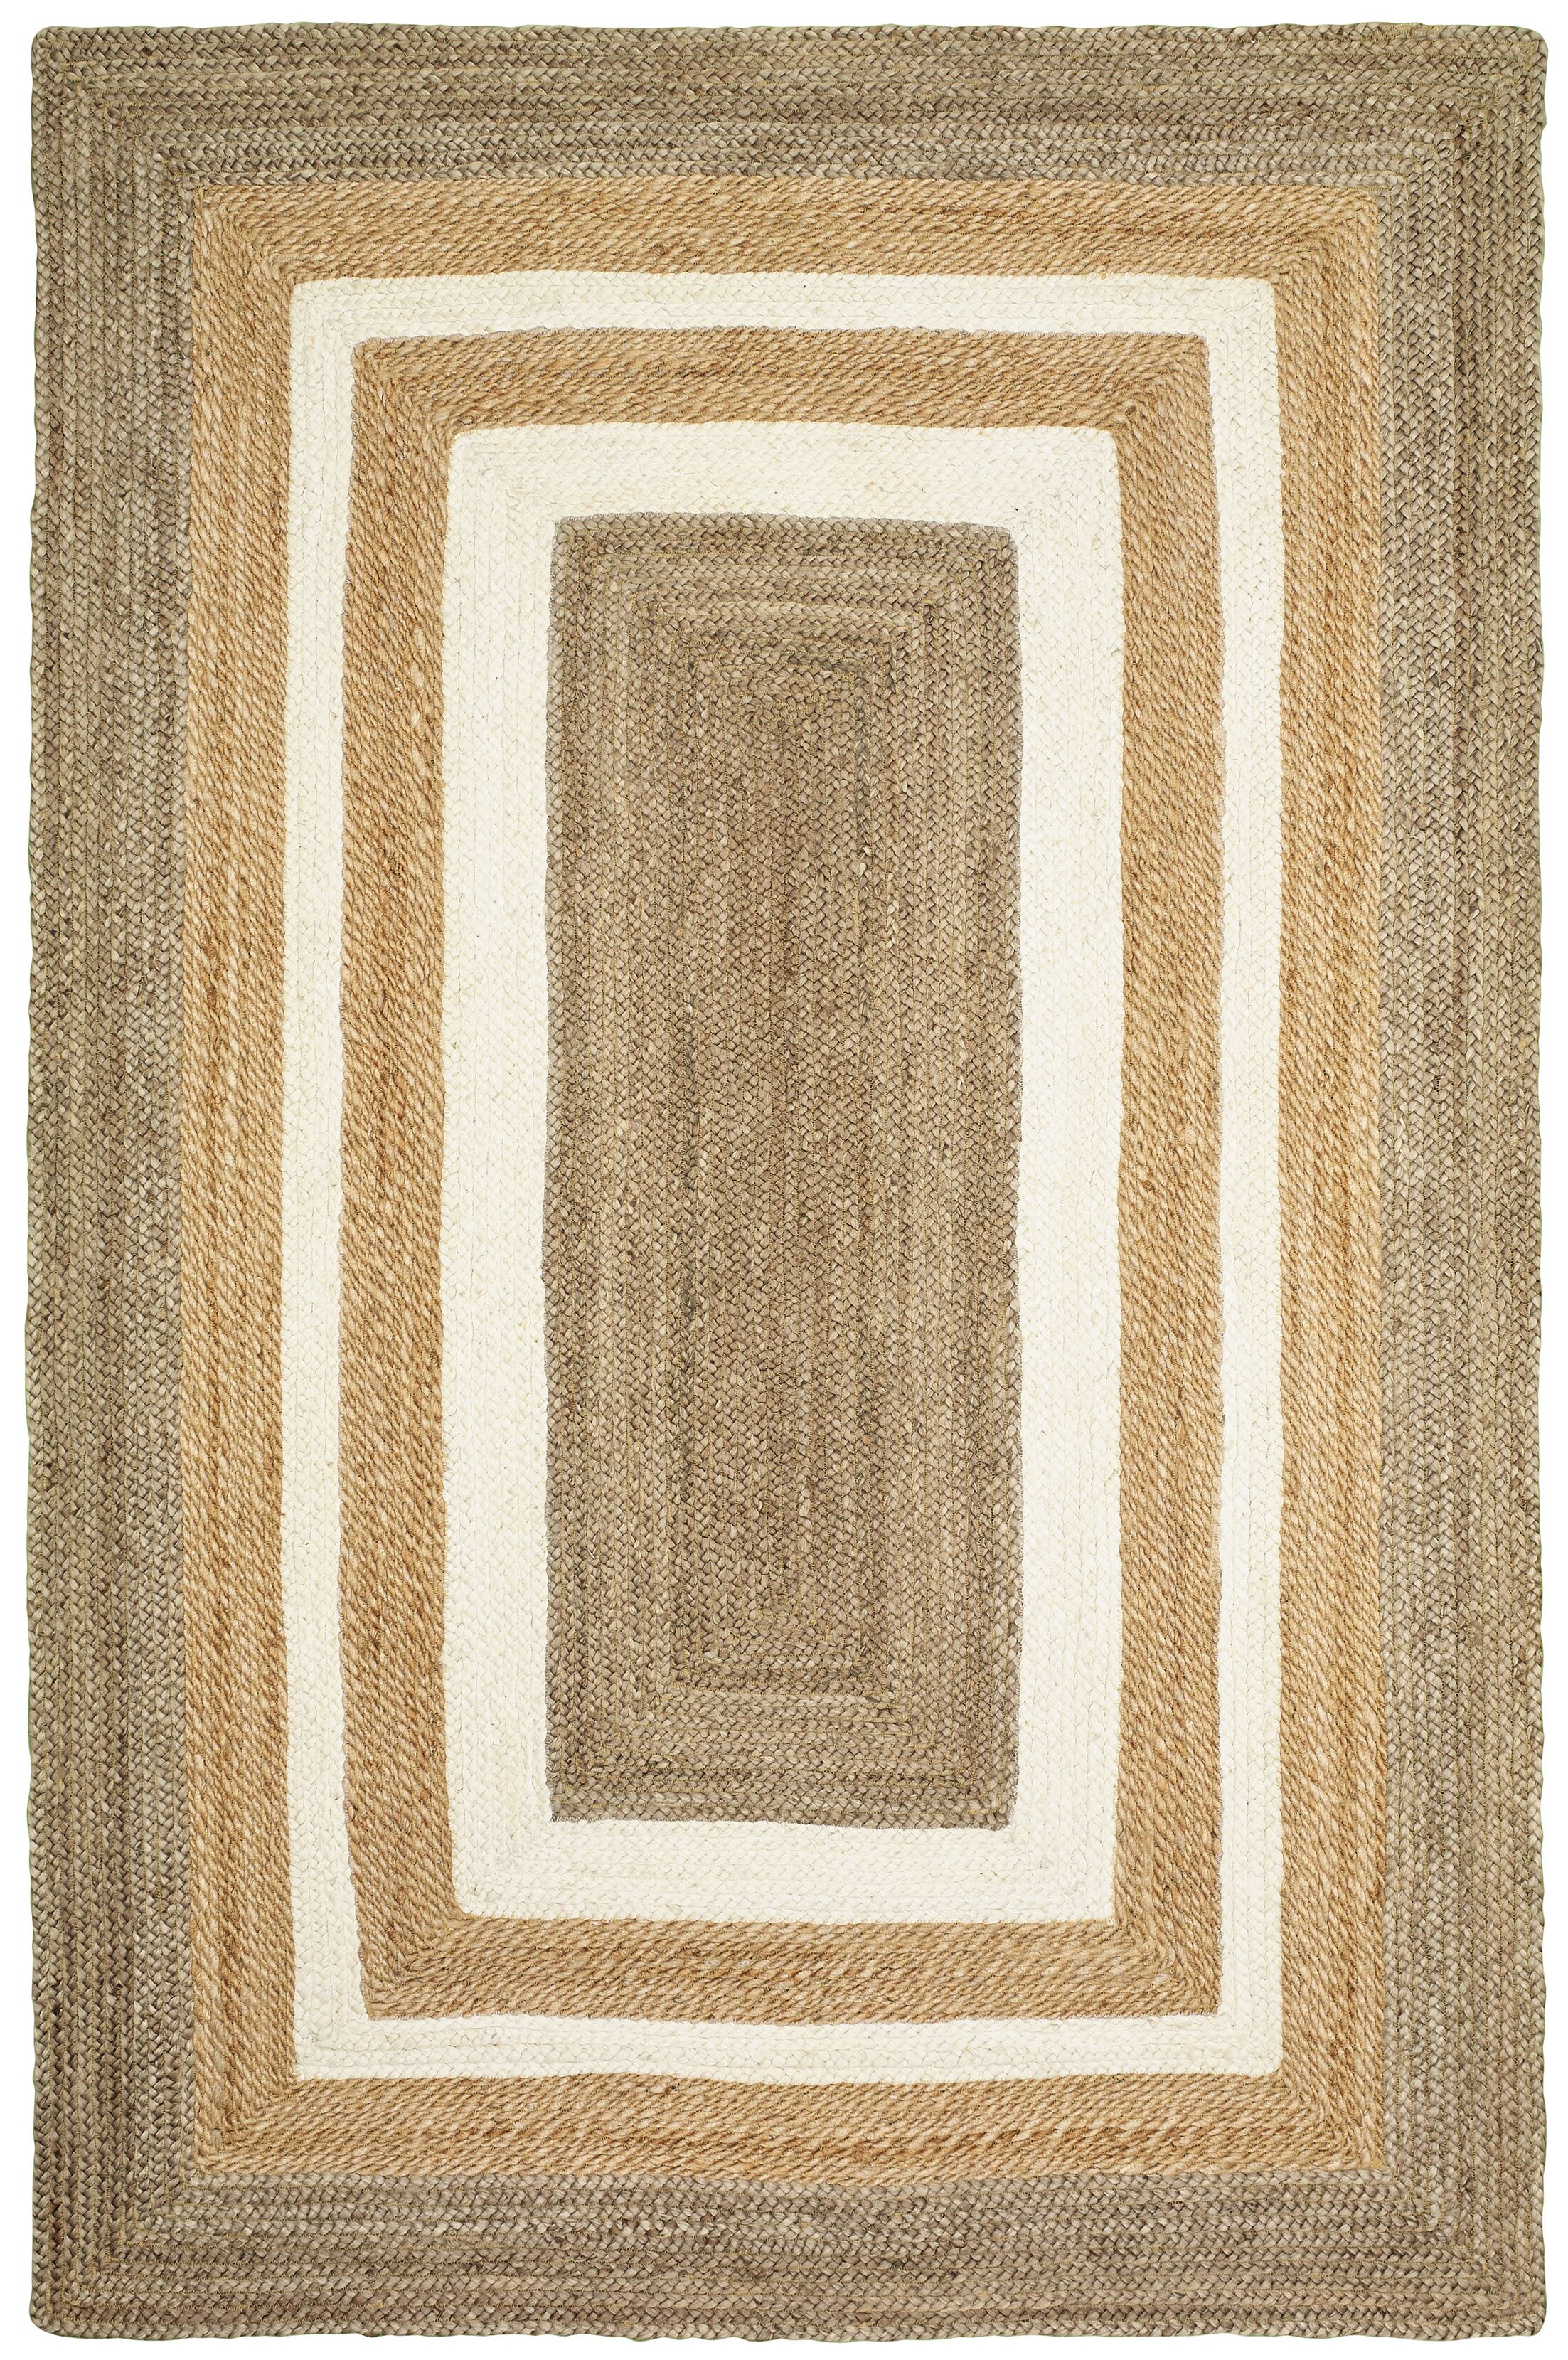 Lechez Jute Hand-Woven Gray/Beige Area Rug Rug Size: 3'6